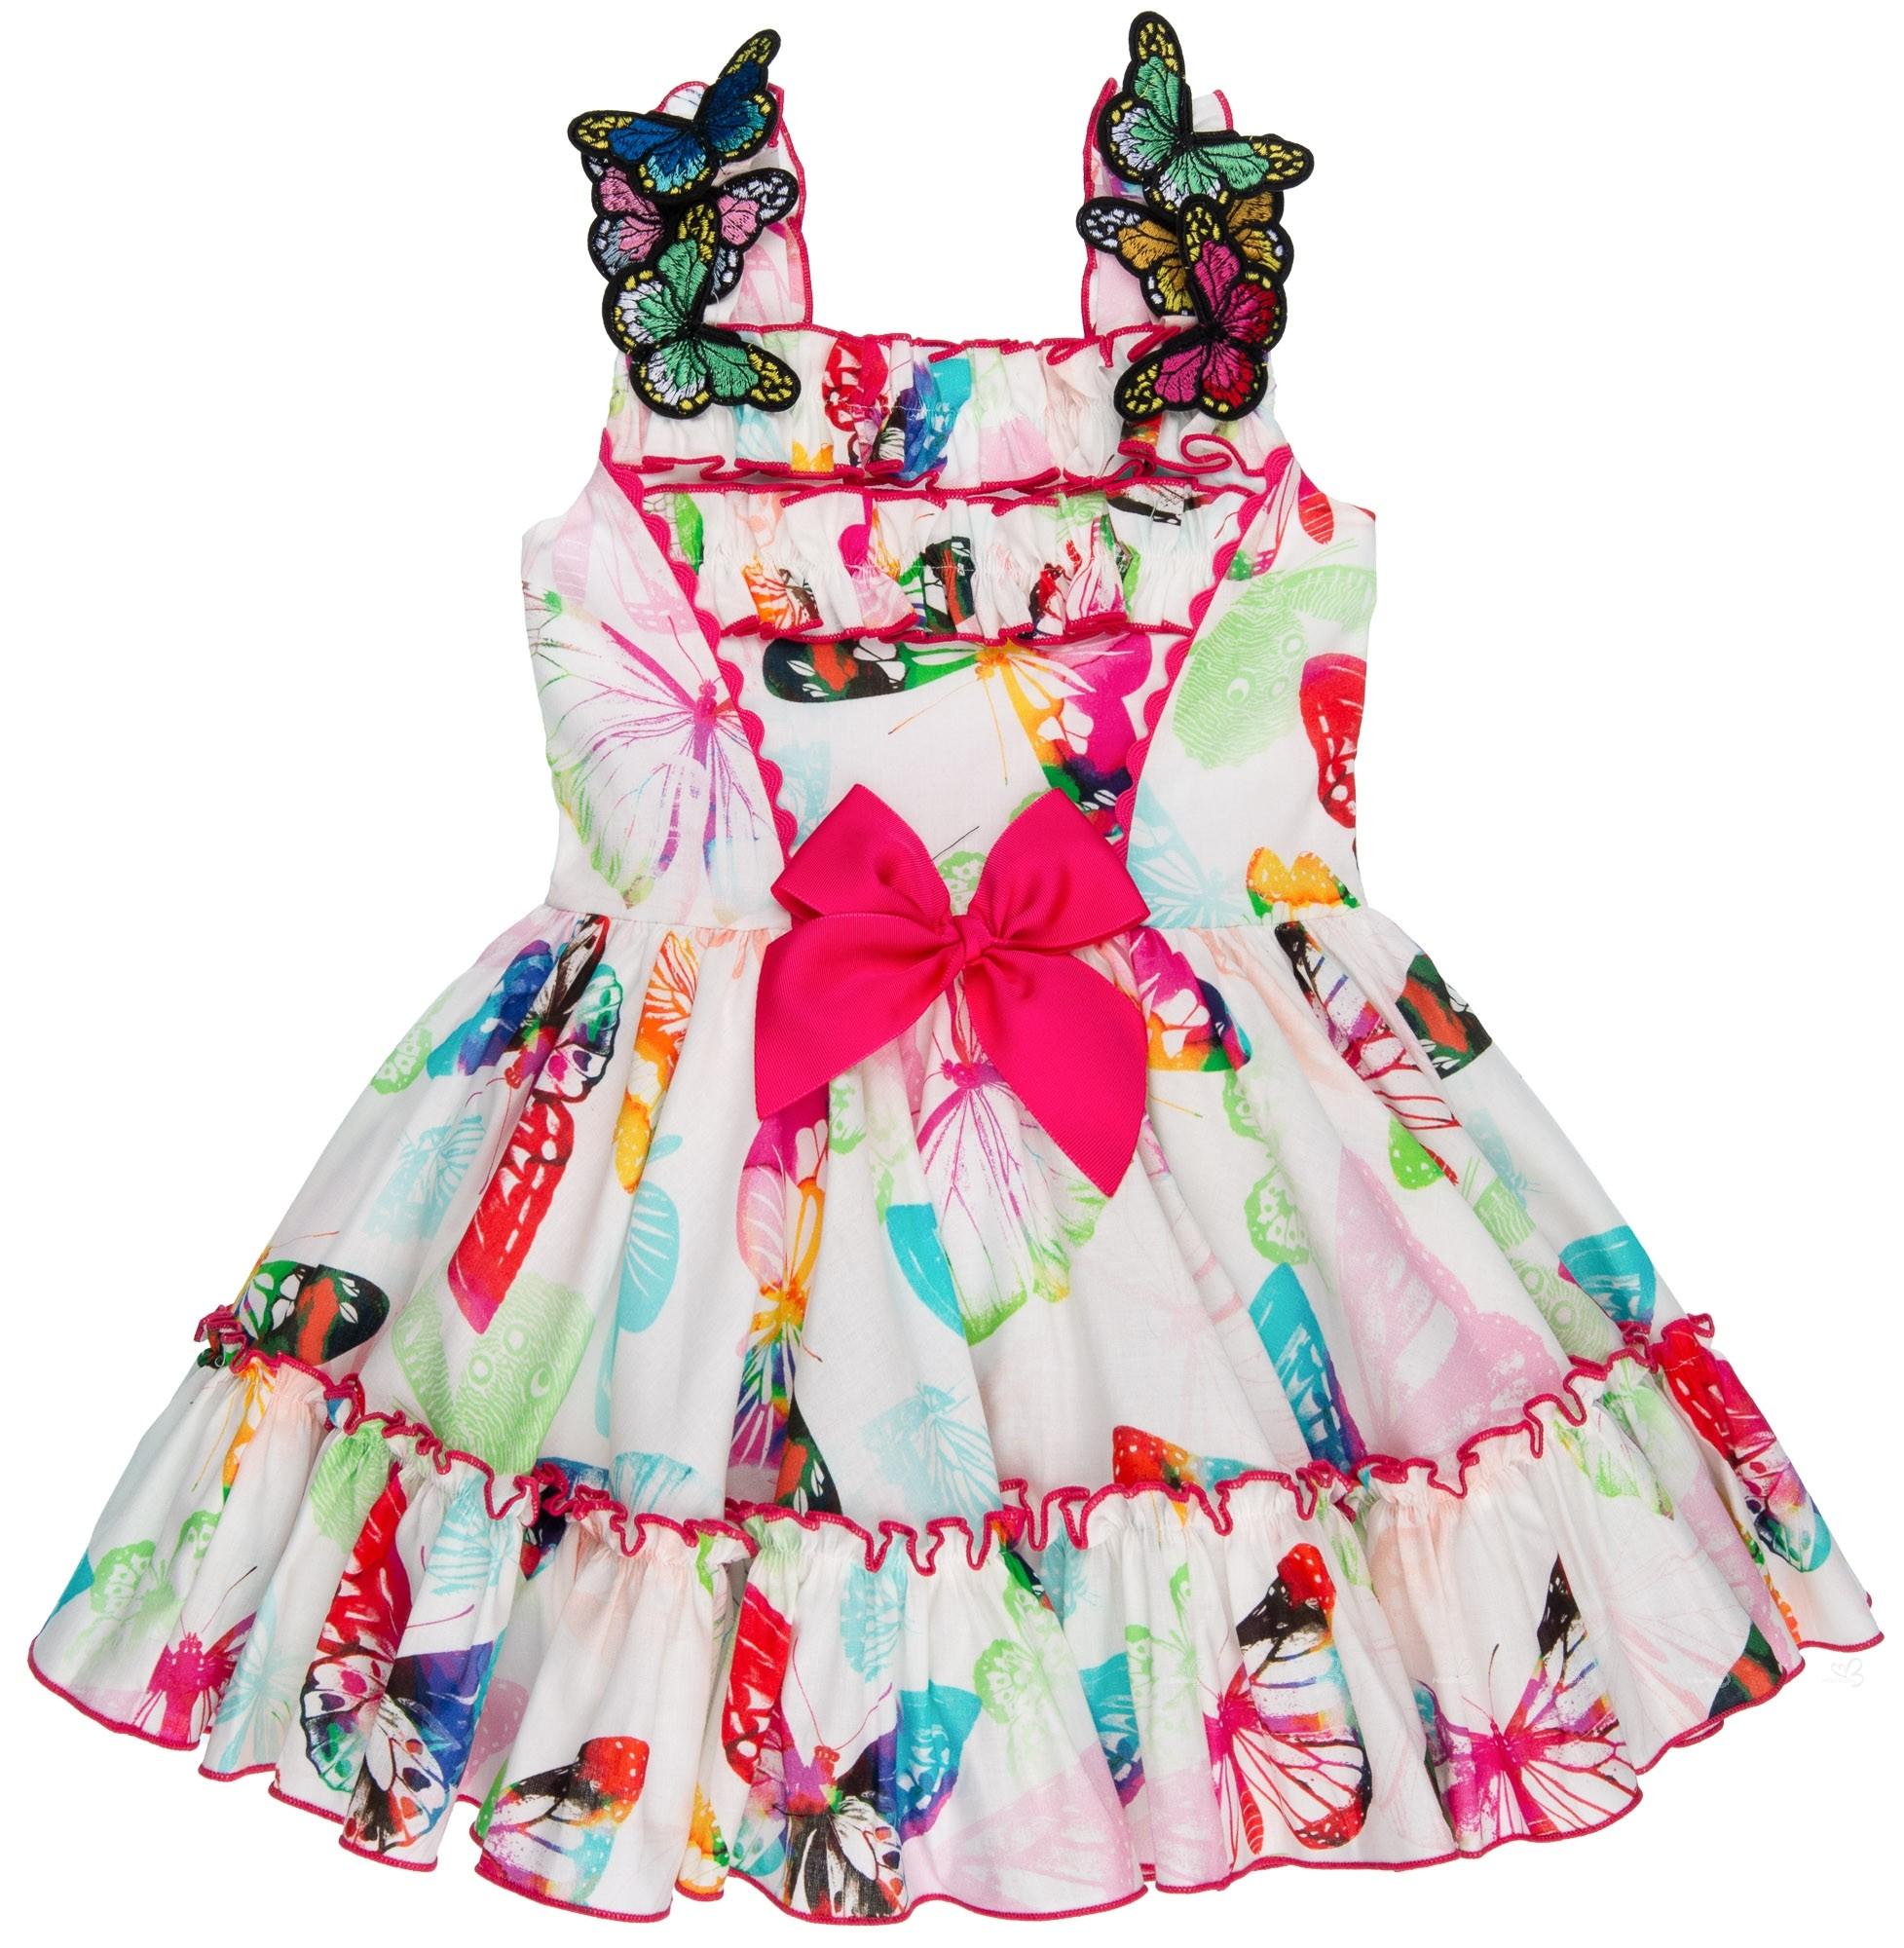 fa30259a2 Nini Moda Infantil Vestido Niña Mariposas   Volantes Fucsia ...